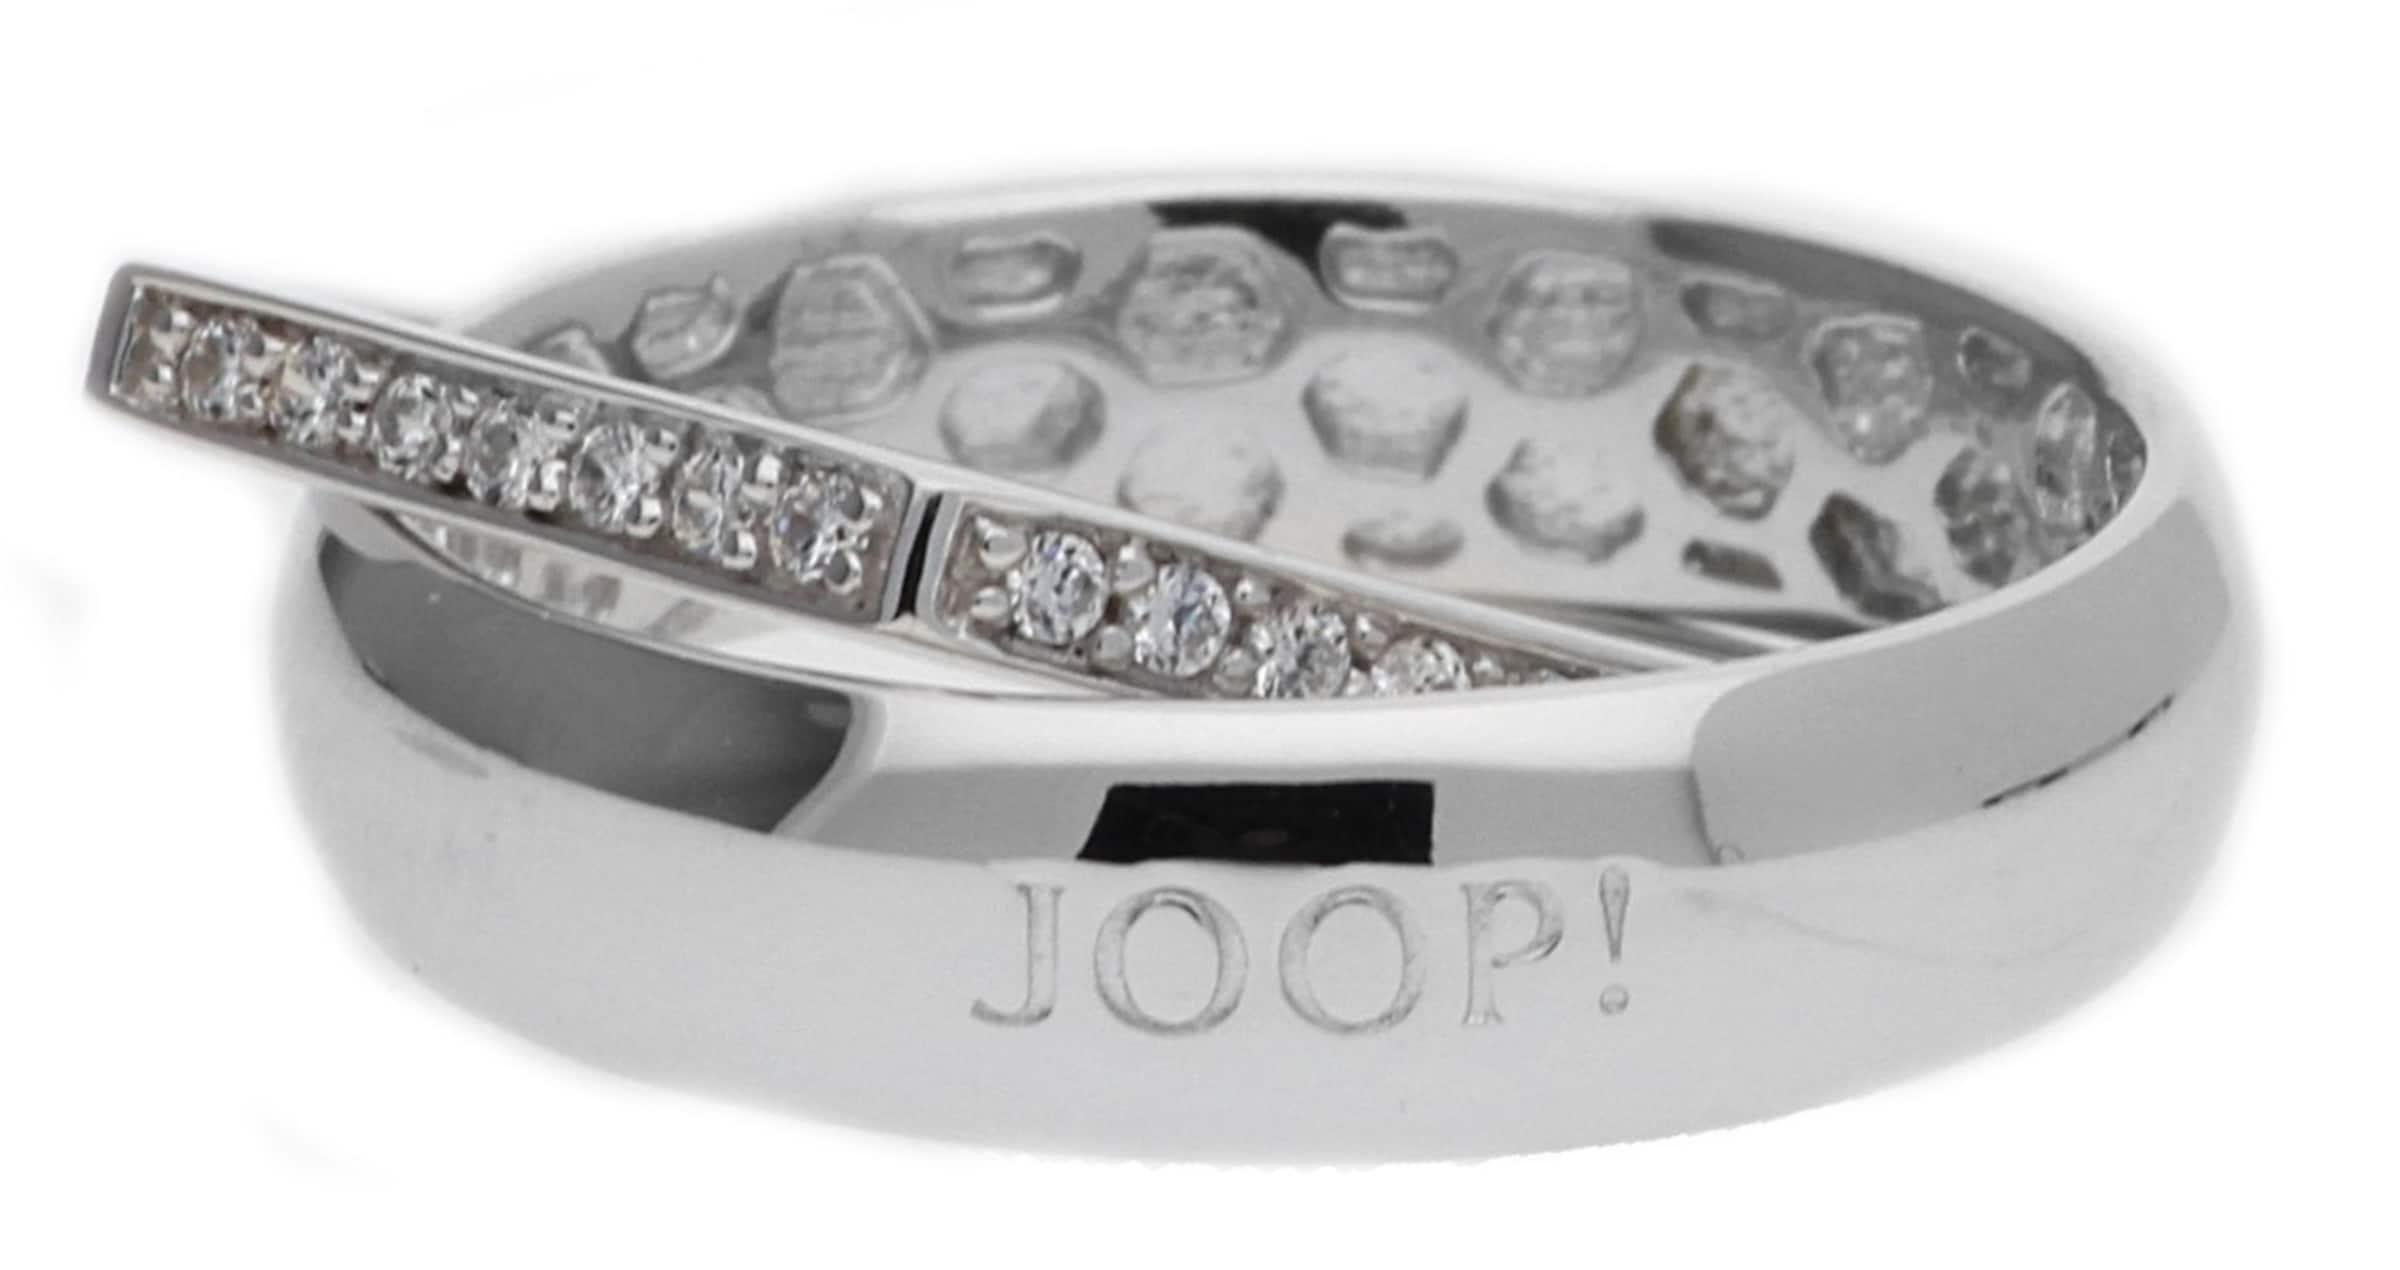 JOOP! Fingerring Silber Silber Edged Rabatt Zuverlässig LFWy2XB